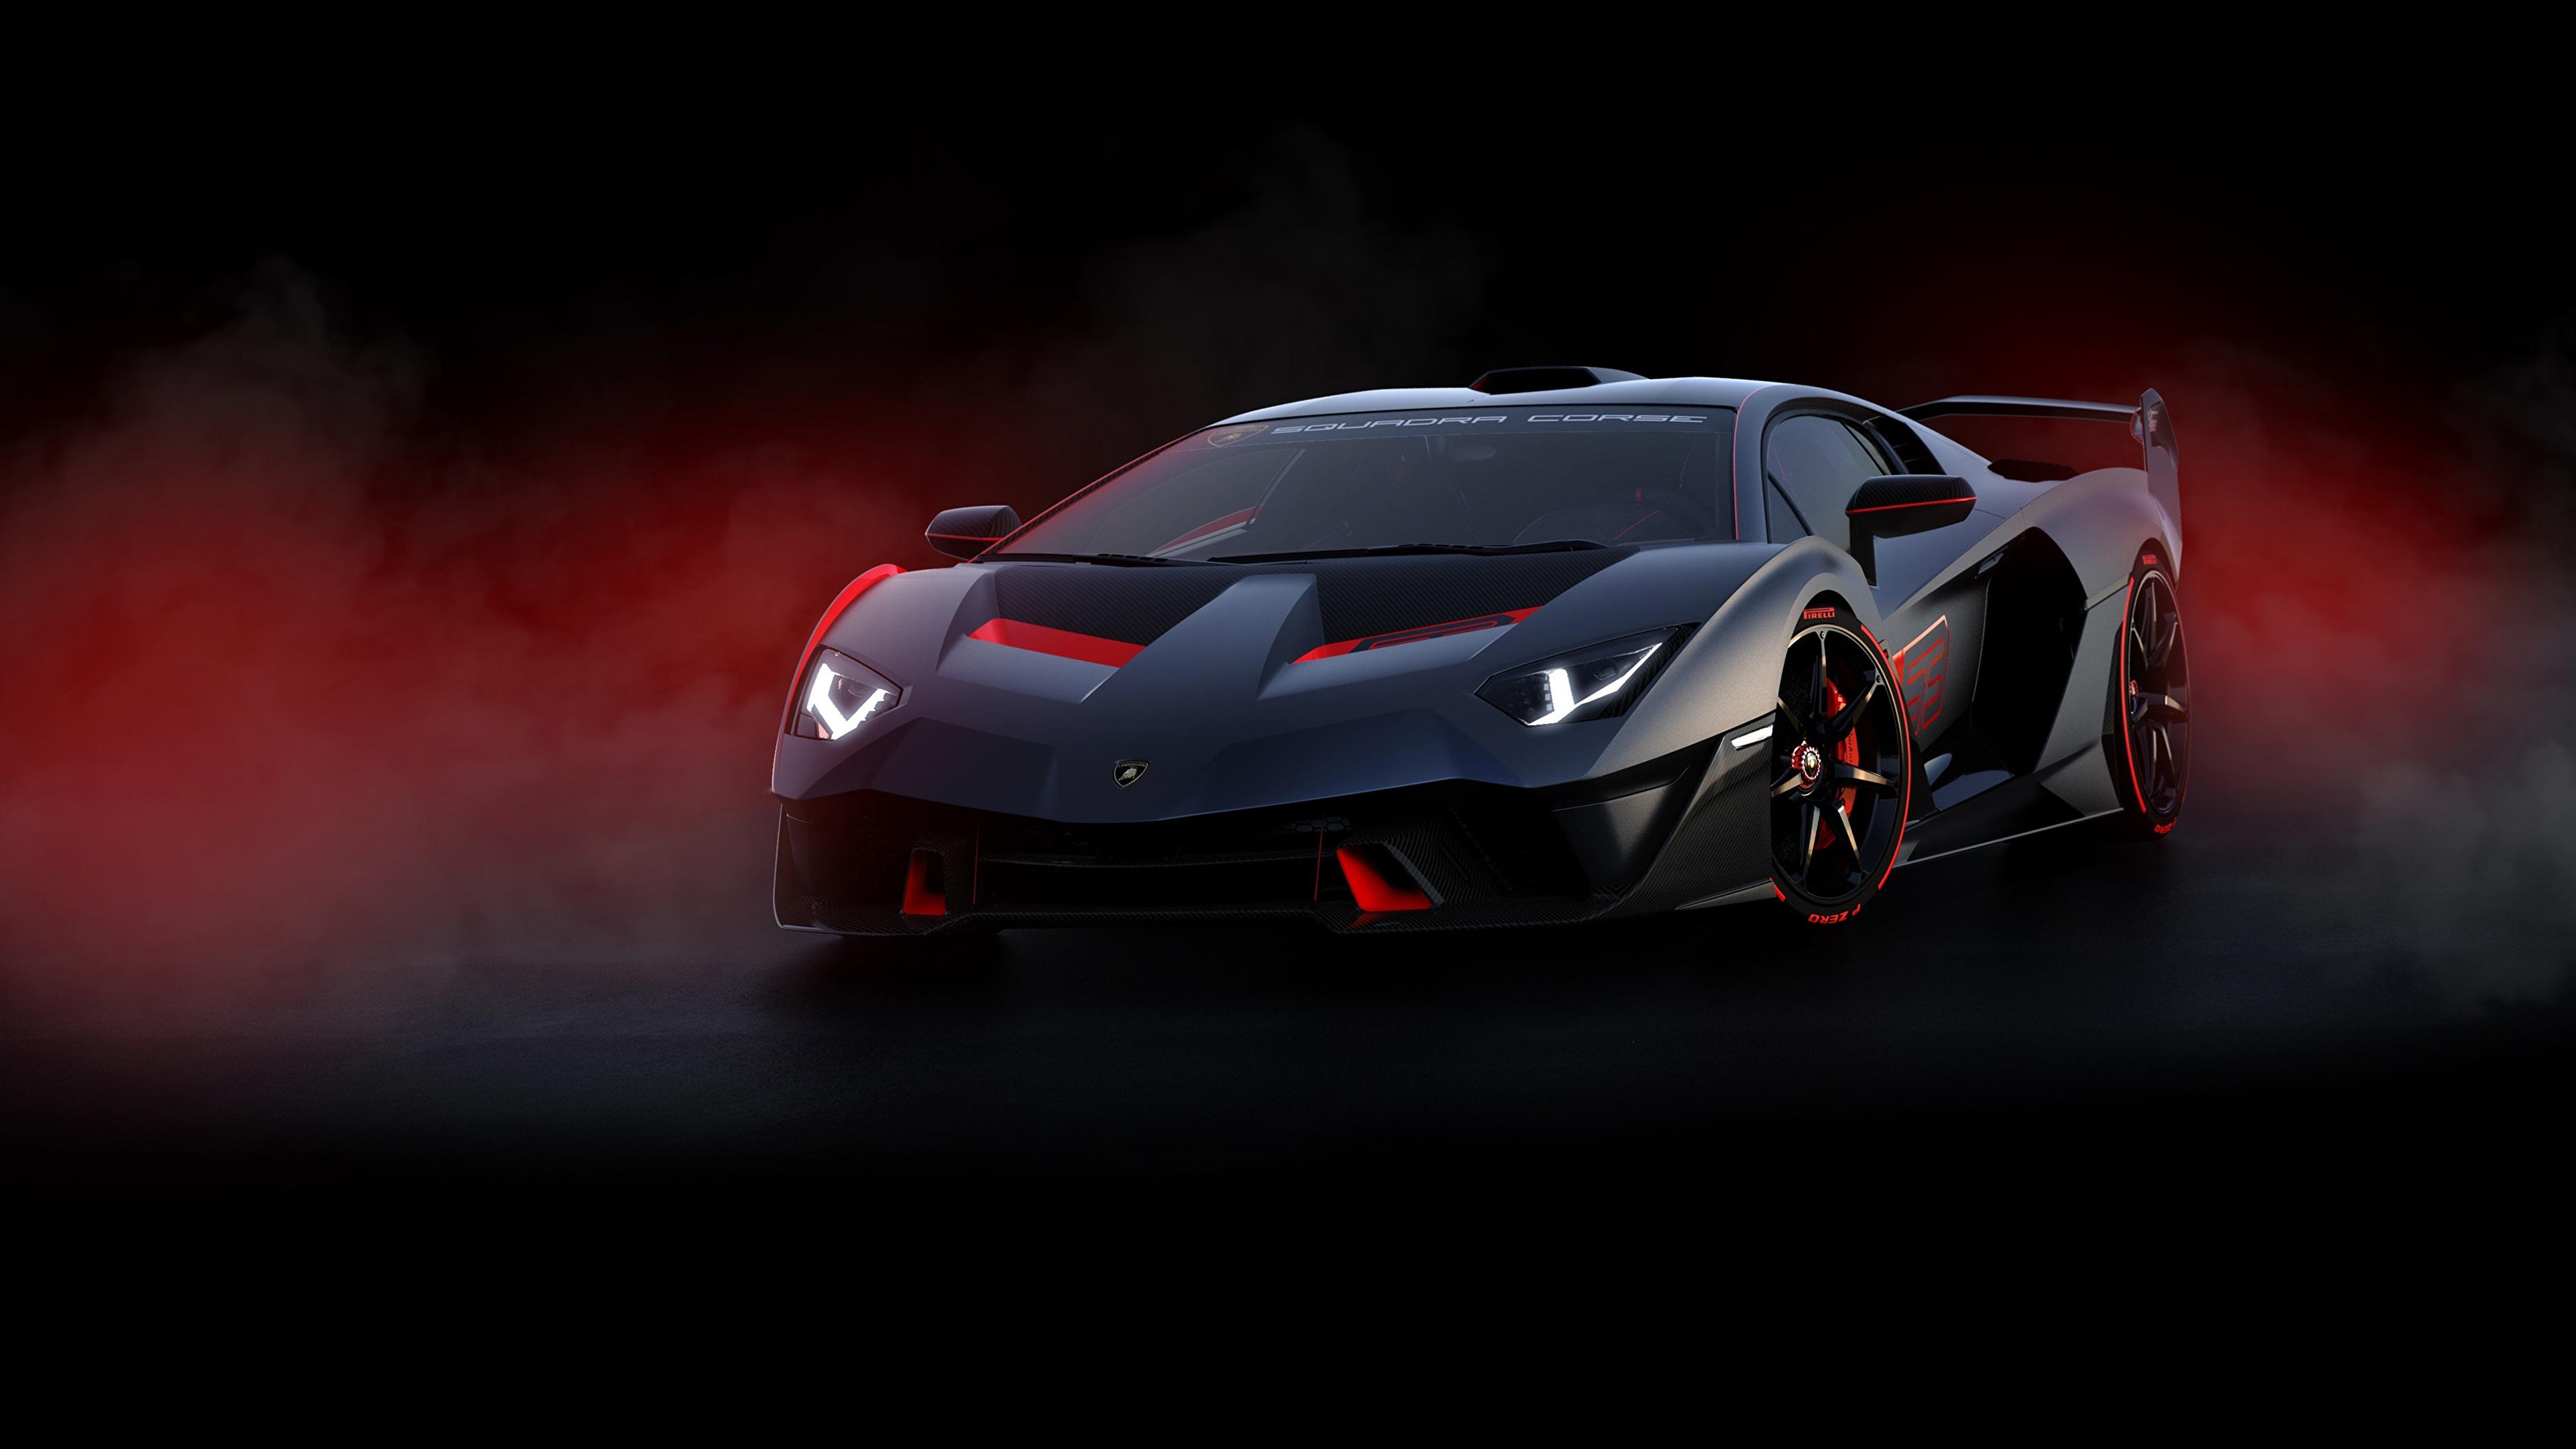 Обои Lamborghini. Автомобили foto 8